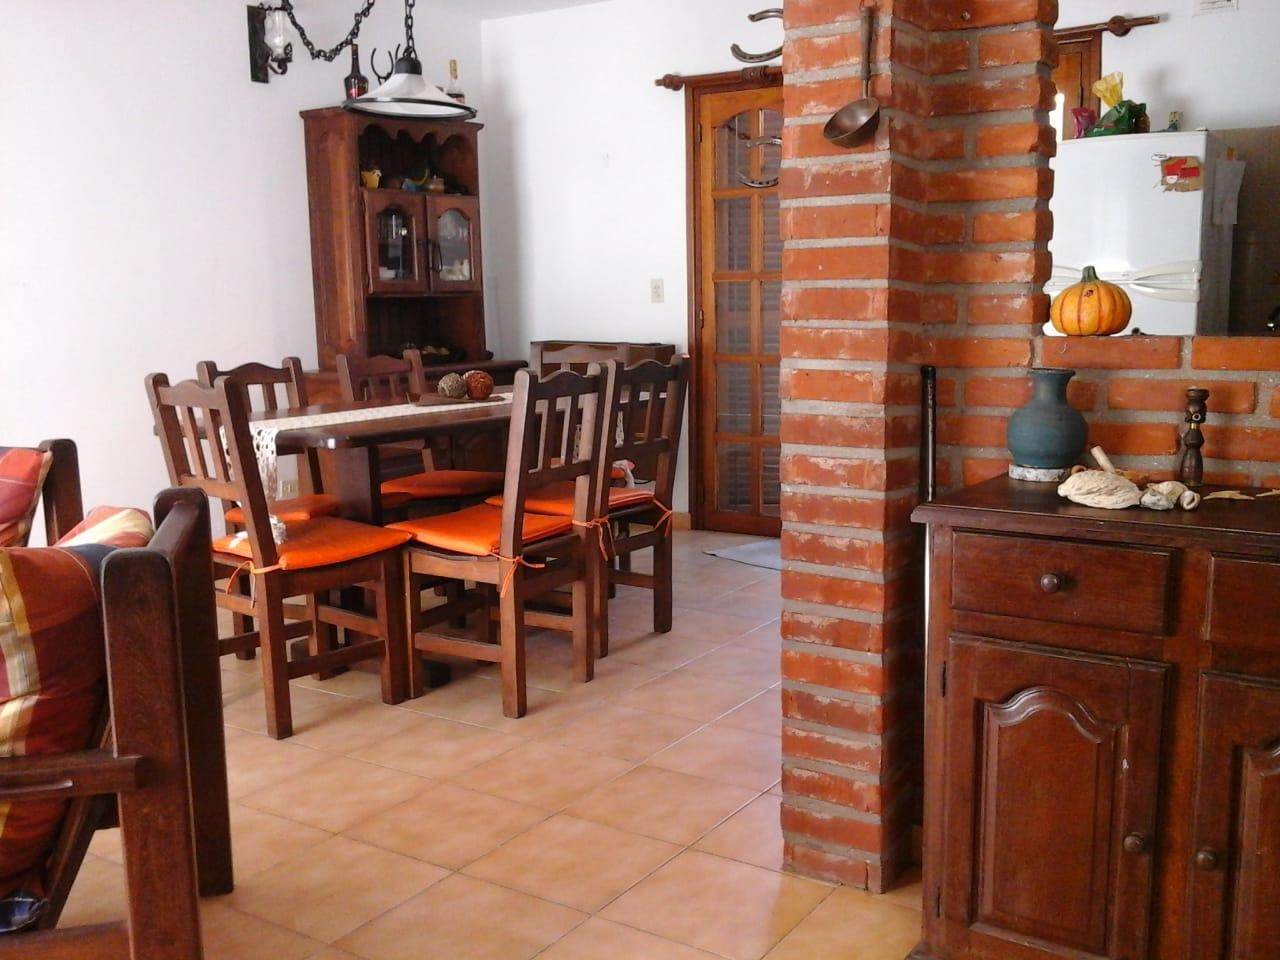 Morrongiello Propiedades - Av. Costanera 5218